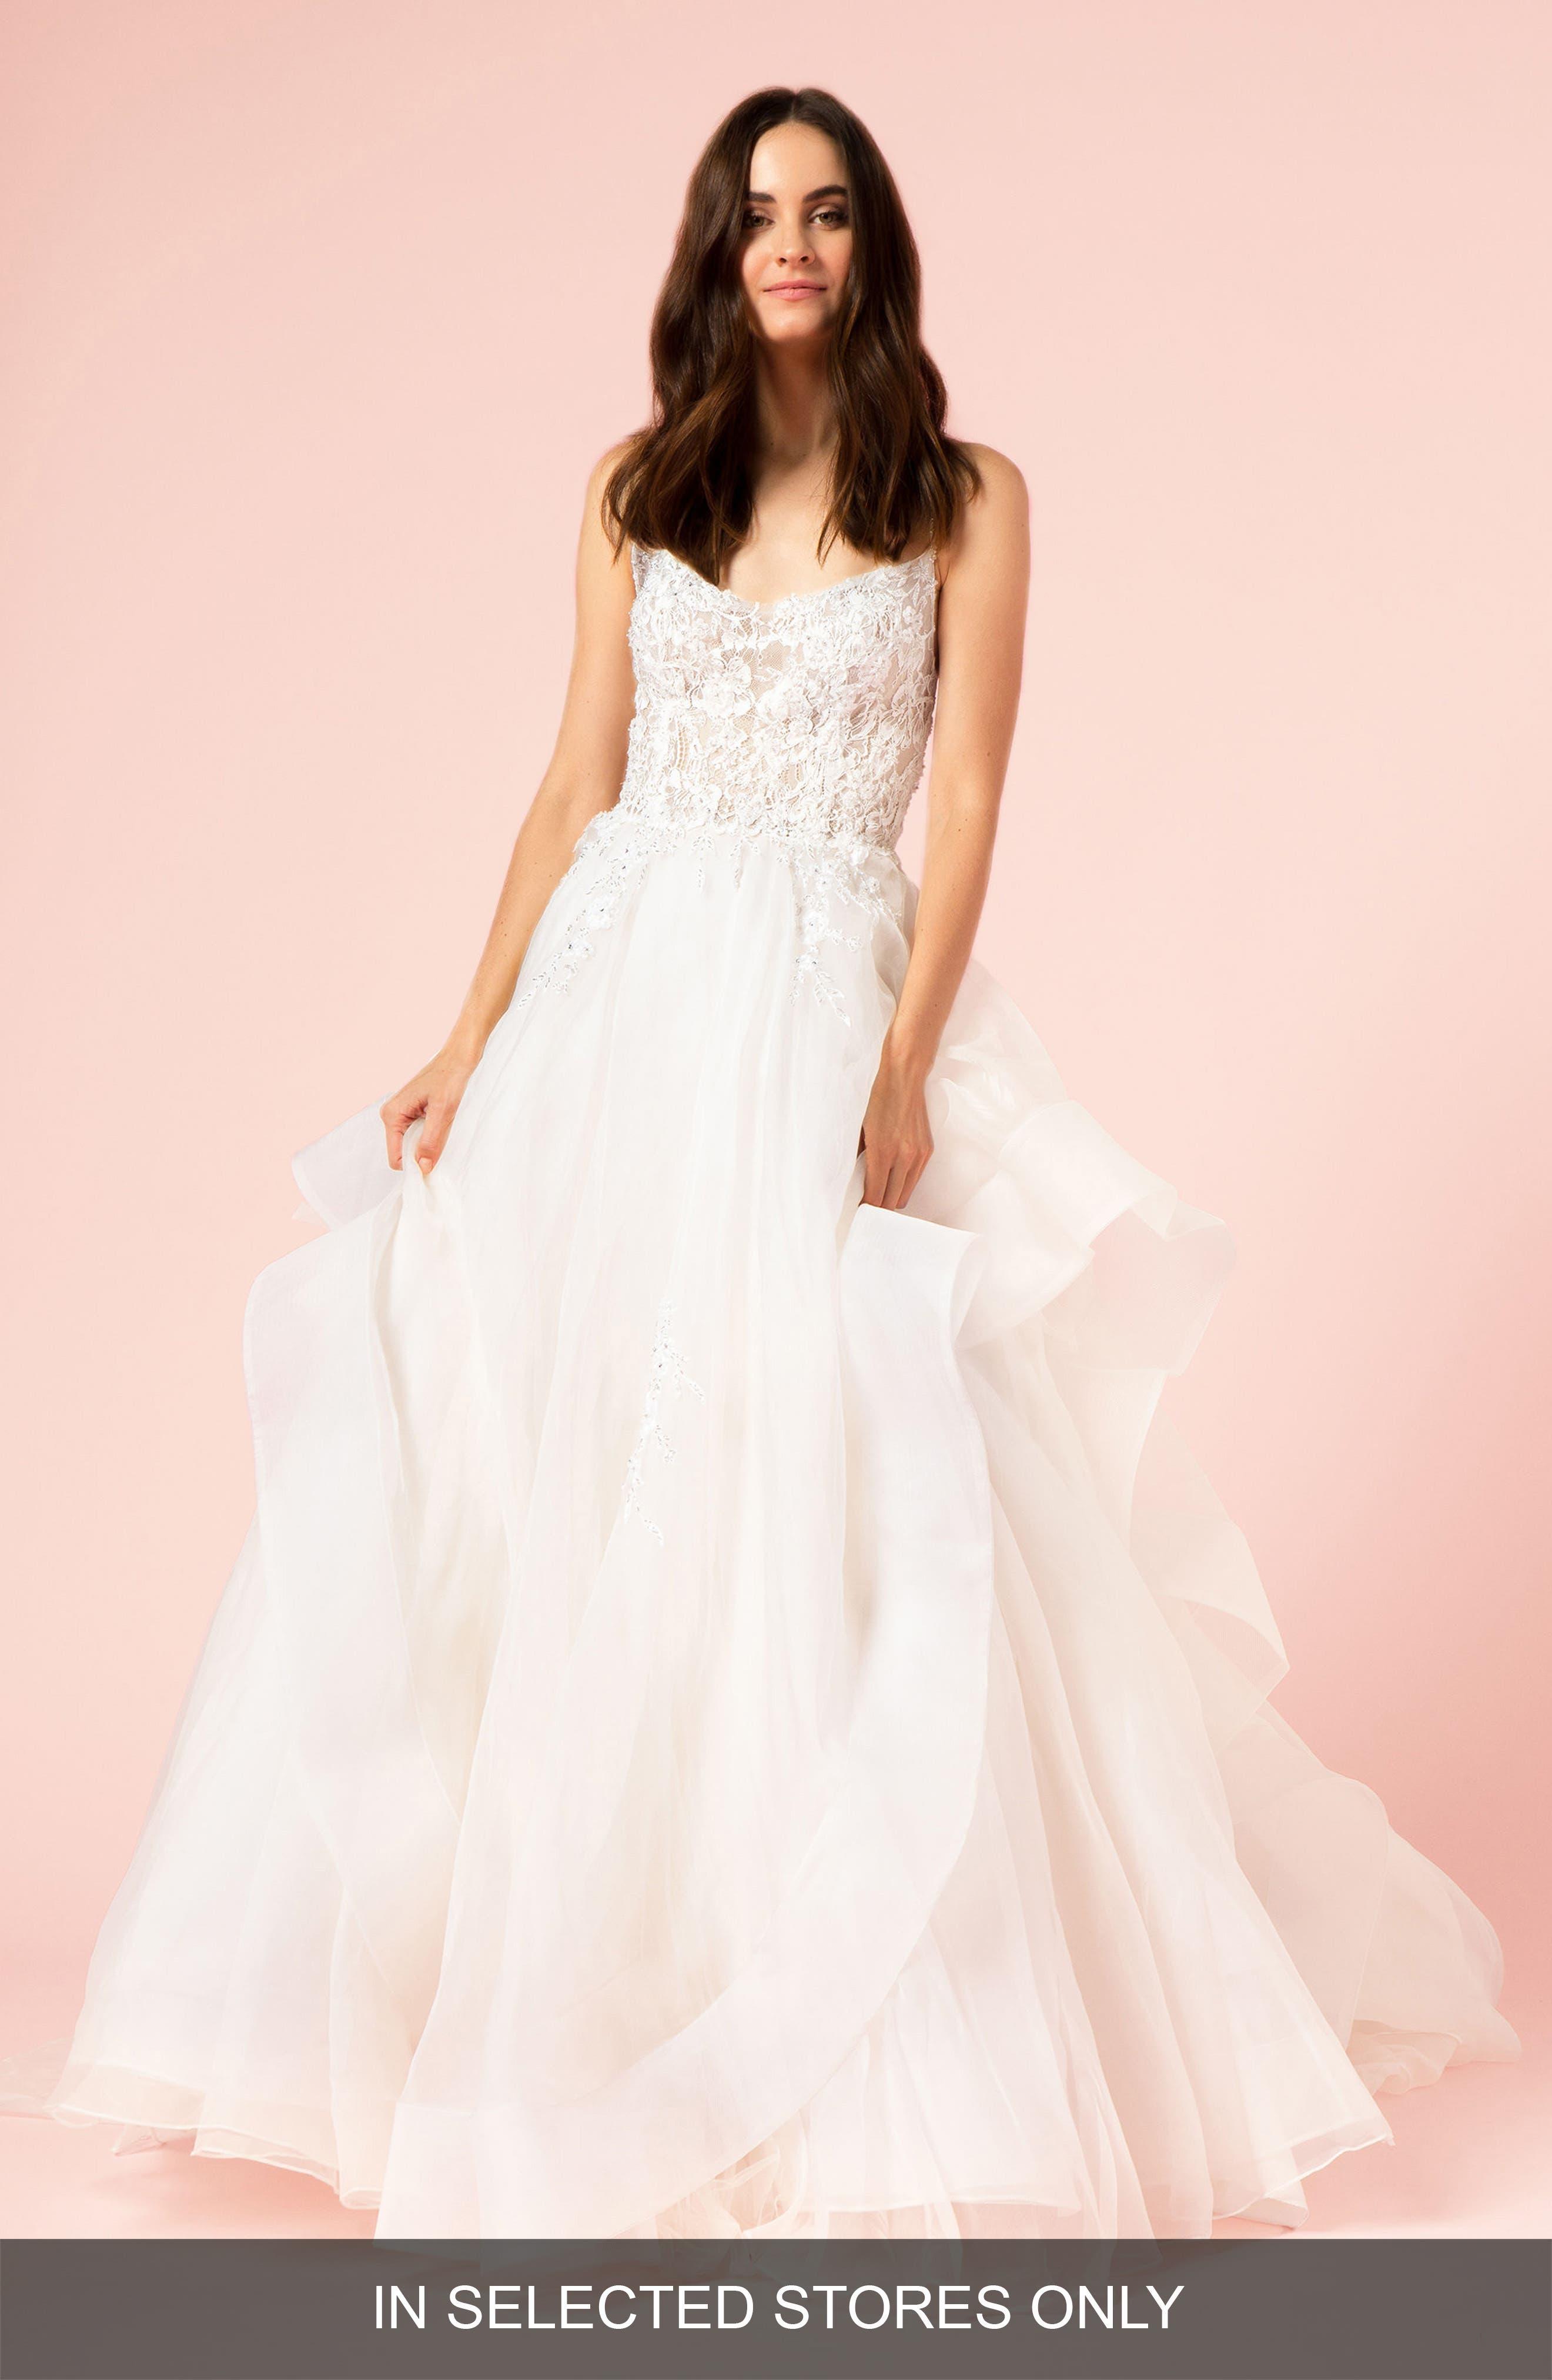 Embellished Lace & Organza Ballgown,                             Main thumbnail 1, color,                             SILK WHITE/ SILK WHITE